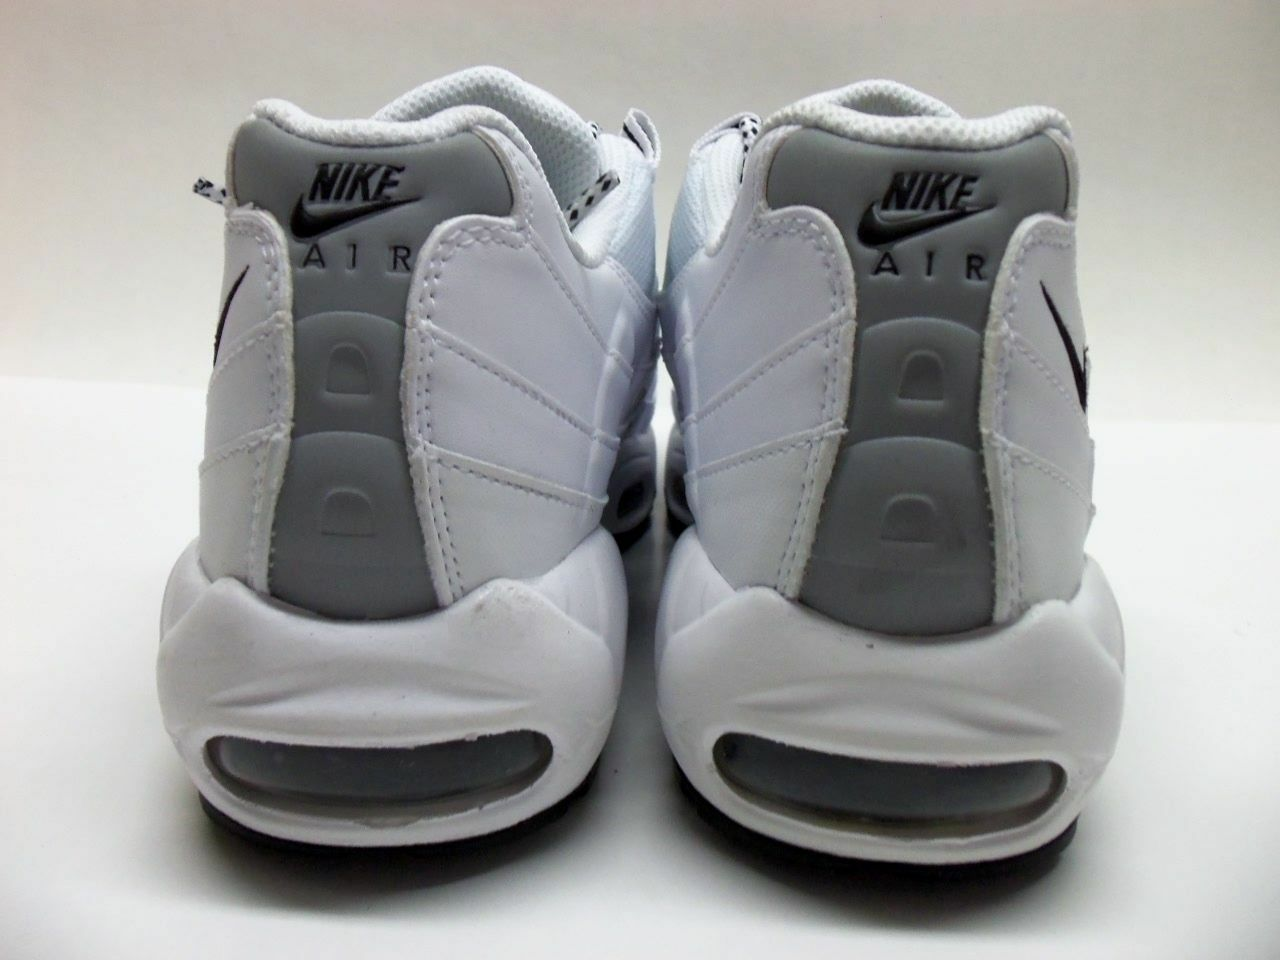 Nike Nike Nike air max 95 scarpe bianche   nero nero uomini 609048 109 sz 13   In Uso Durevole    Uomini/Donne Scarpa  88af06